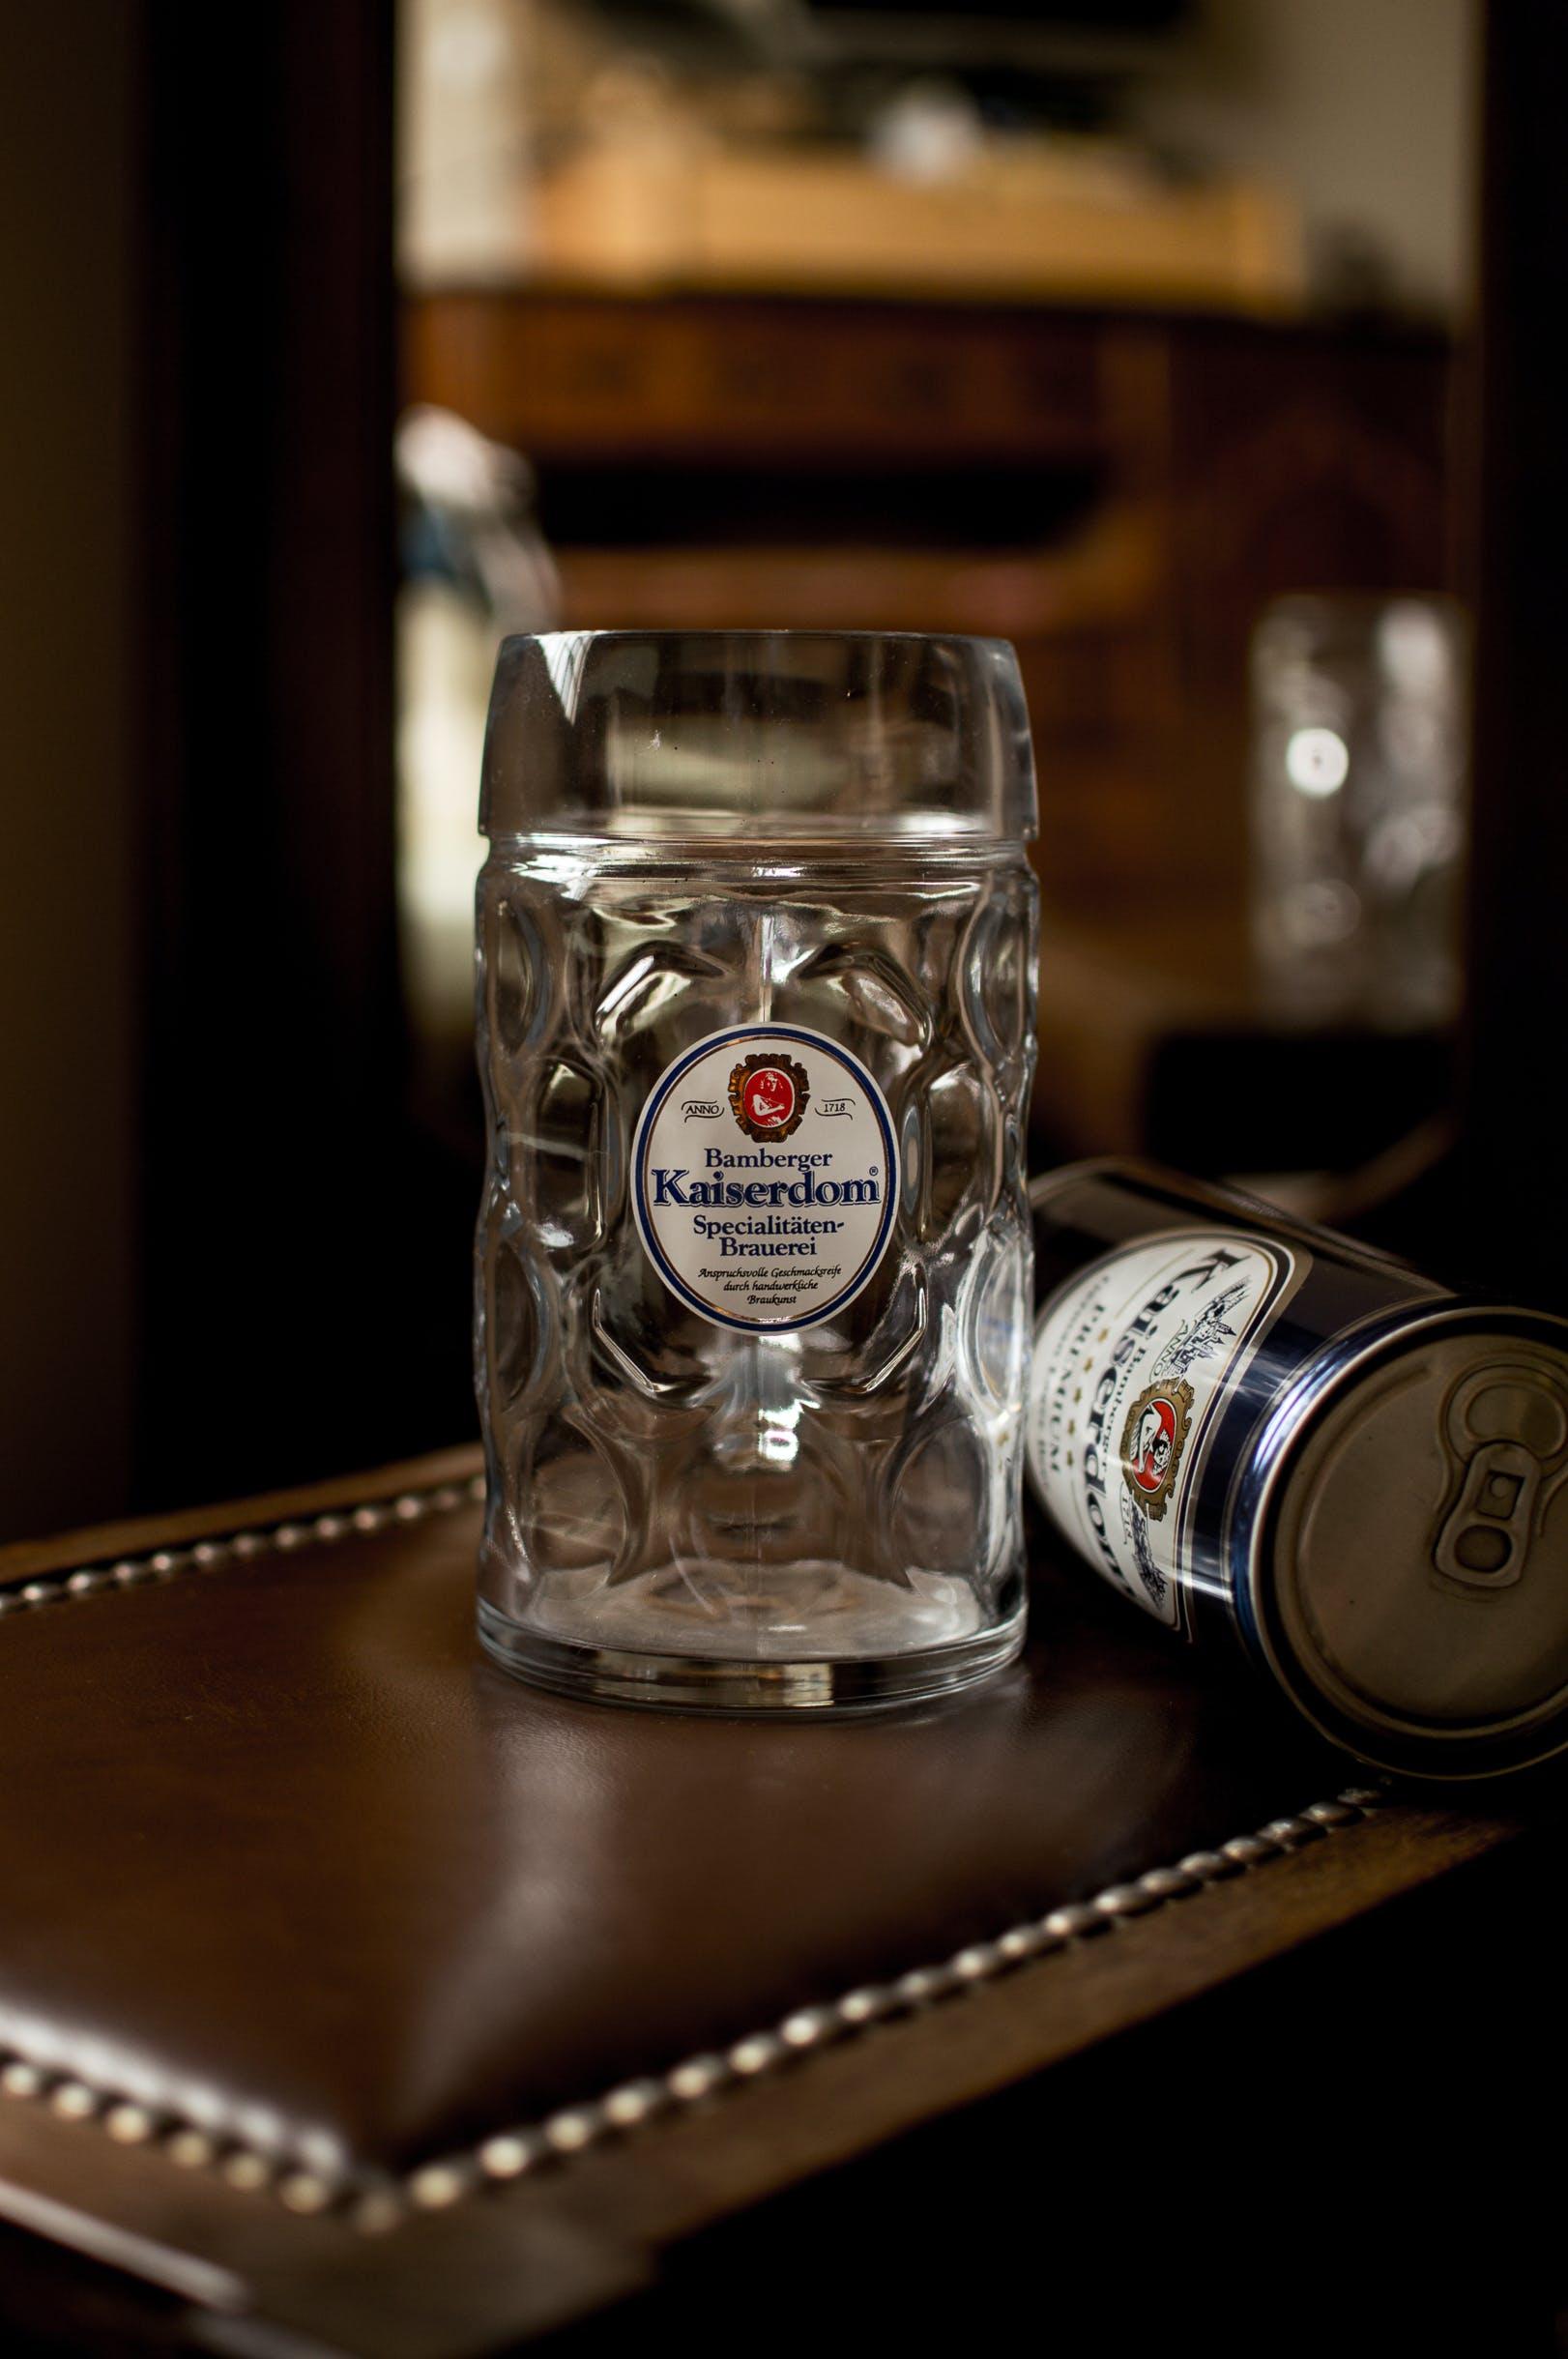 alcoholic beverage, bar, beer